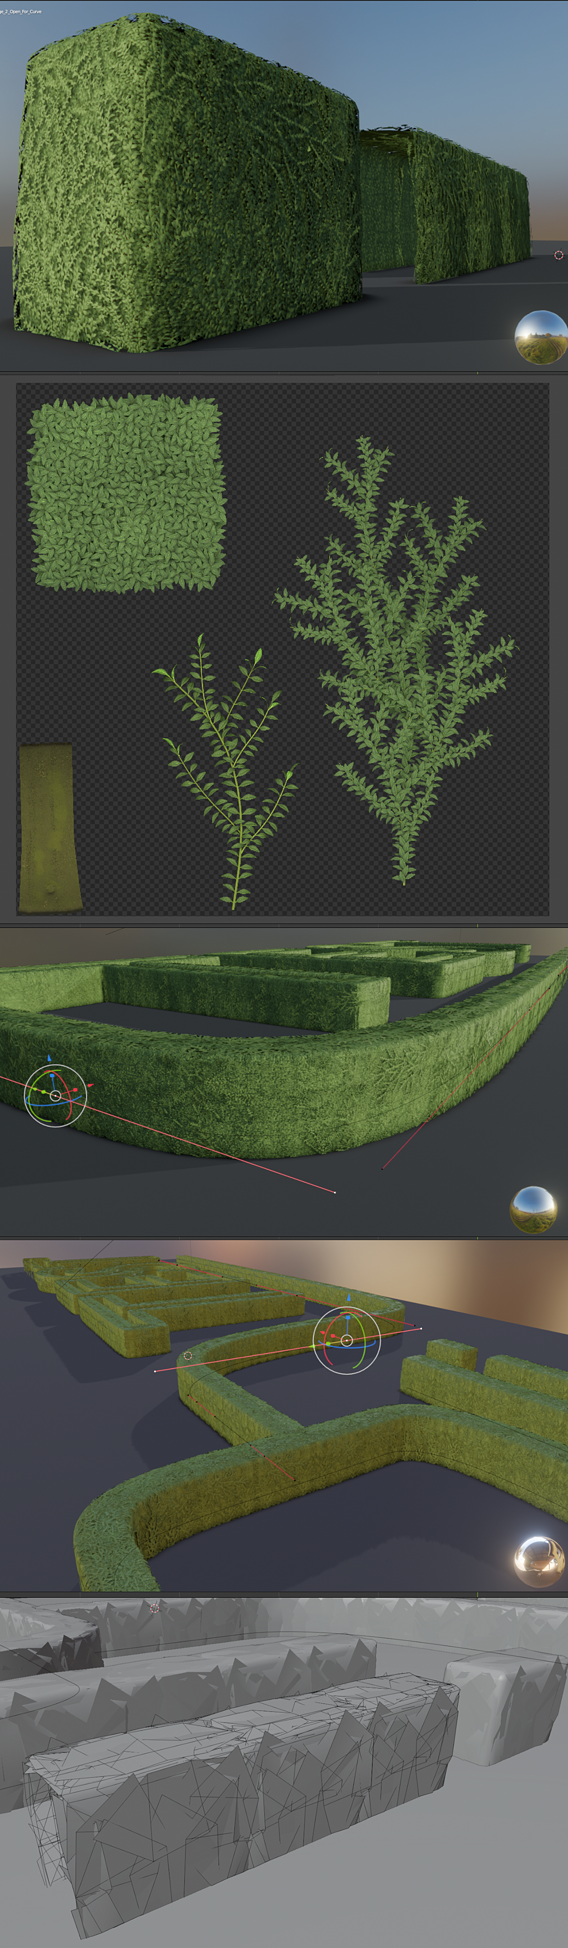 Low-Poly Boxwood Hedge Version 2 (Blender-2.91 Eevee)